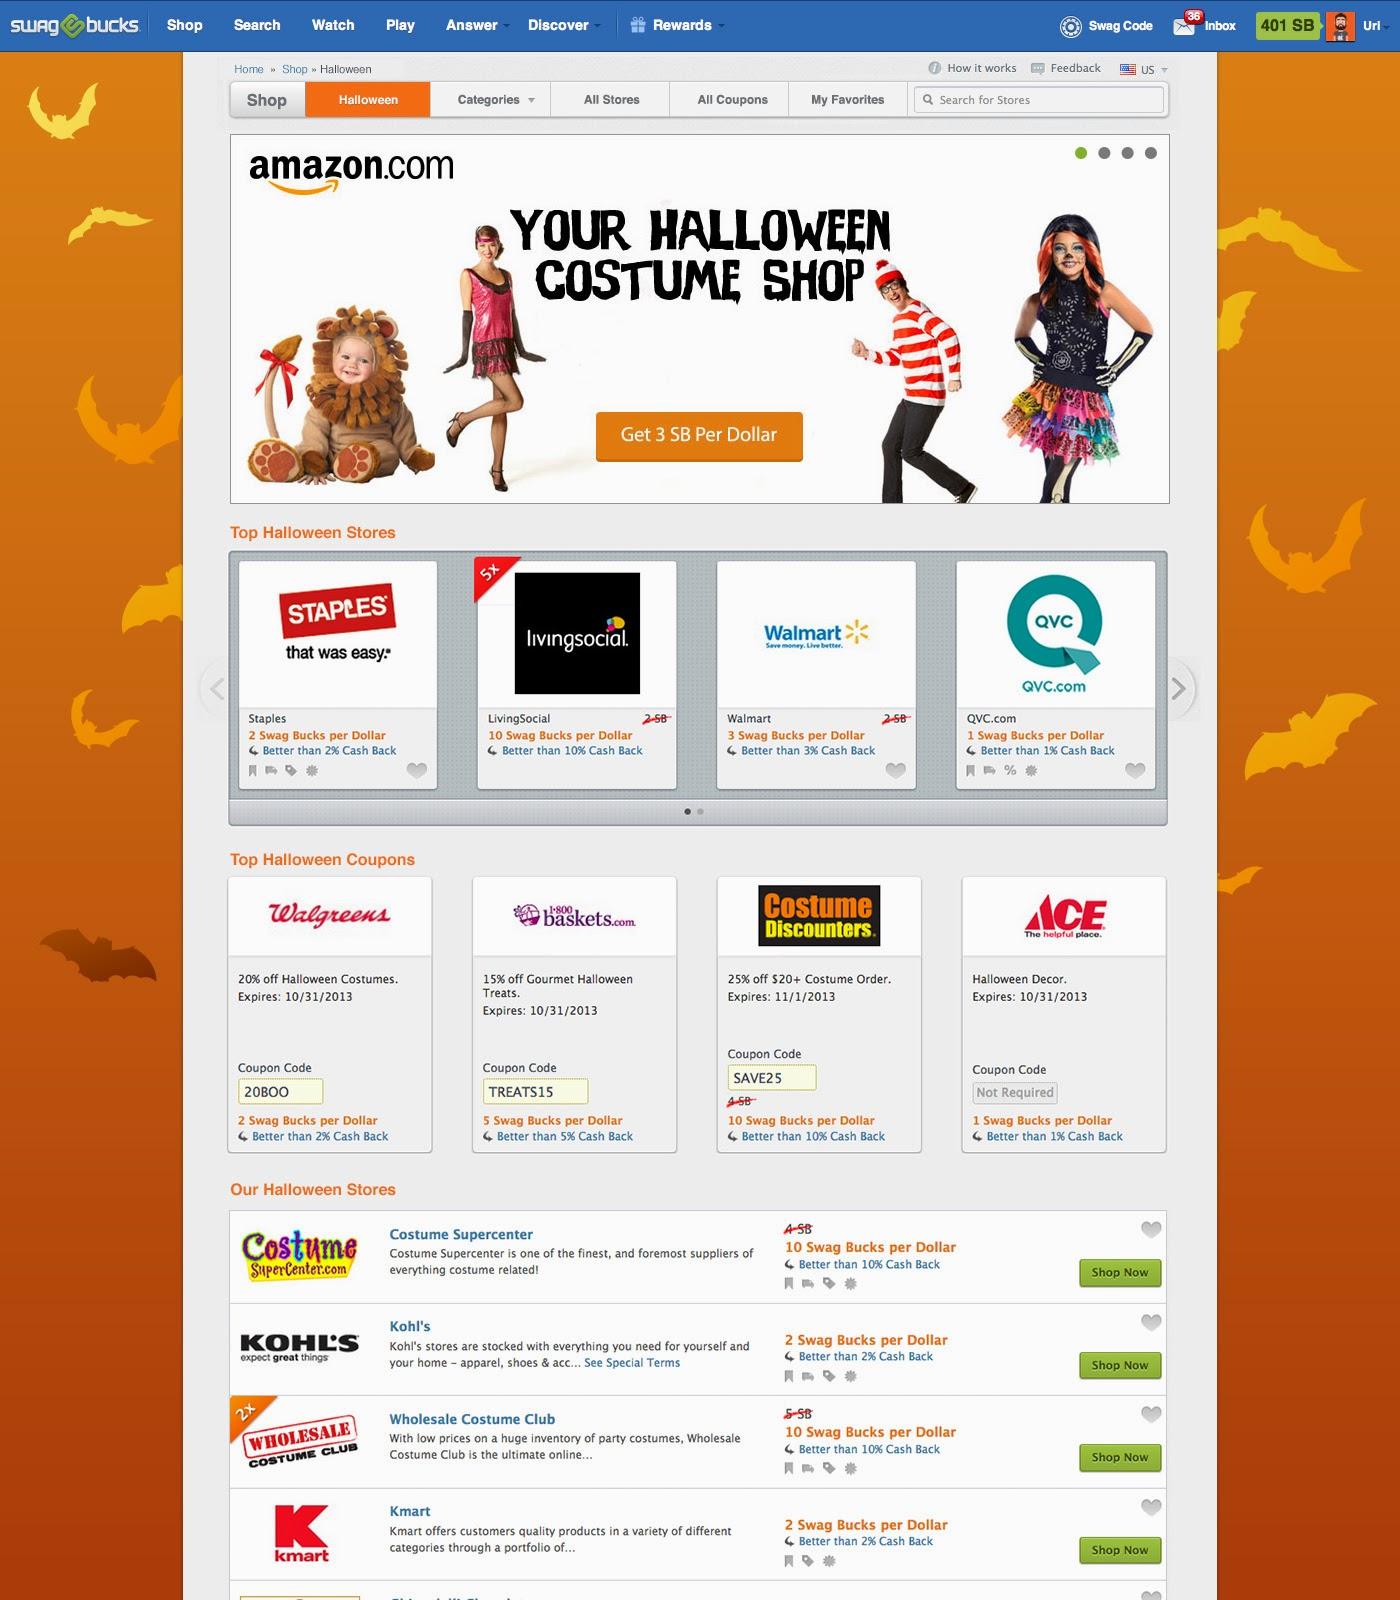 Swagbucks Amazon Halloween